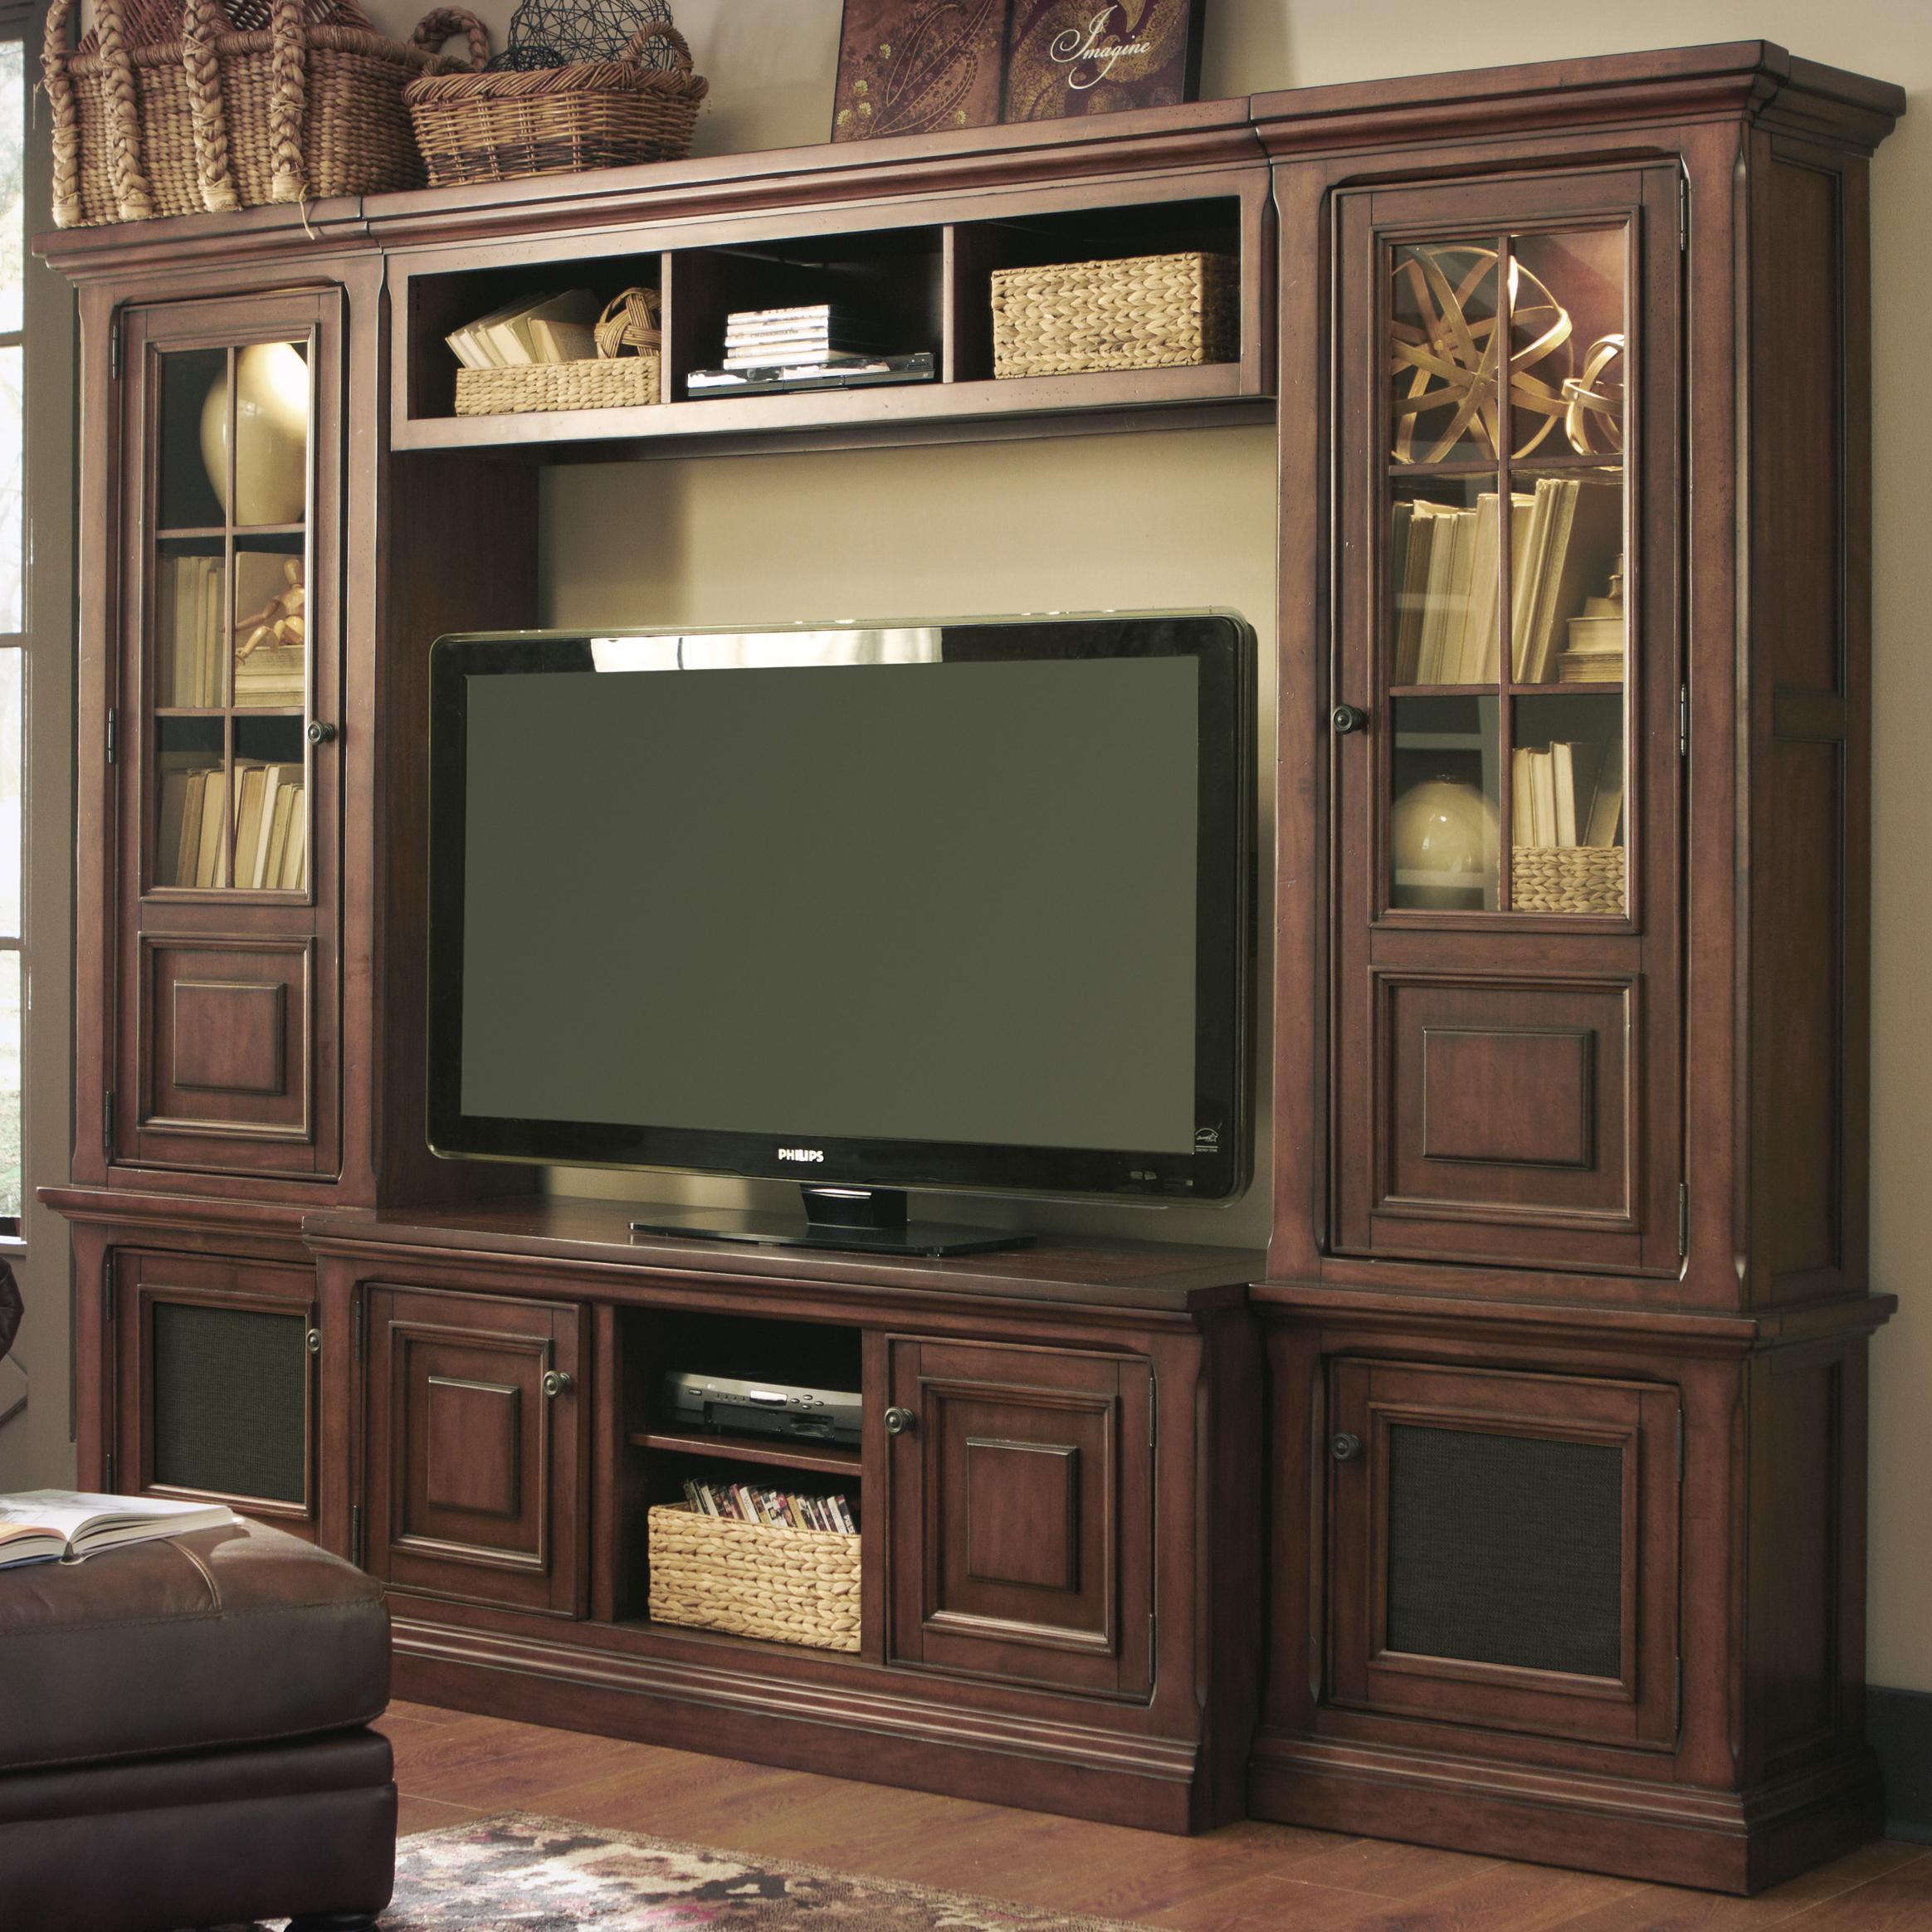 option stand tv ashley roddinton furniture w center xl entertainment fireplace product